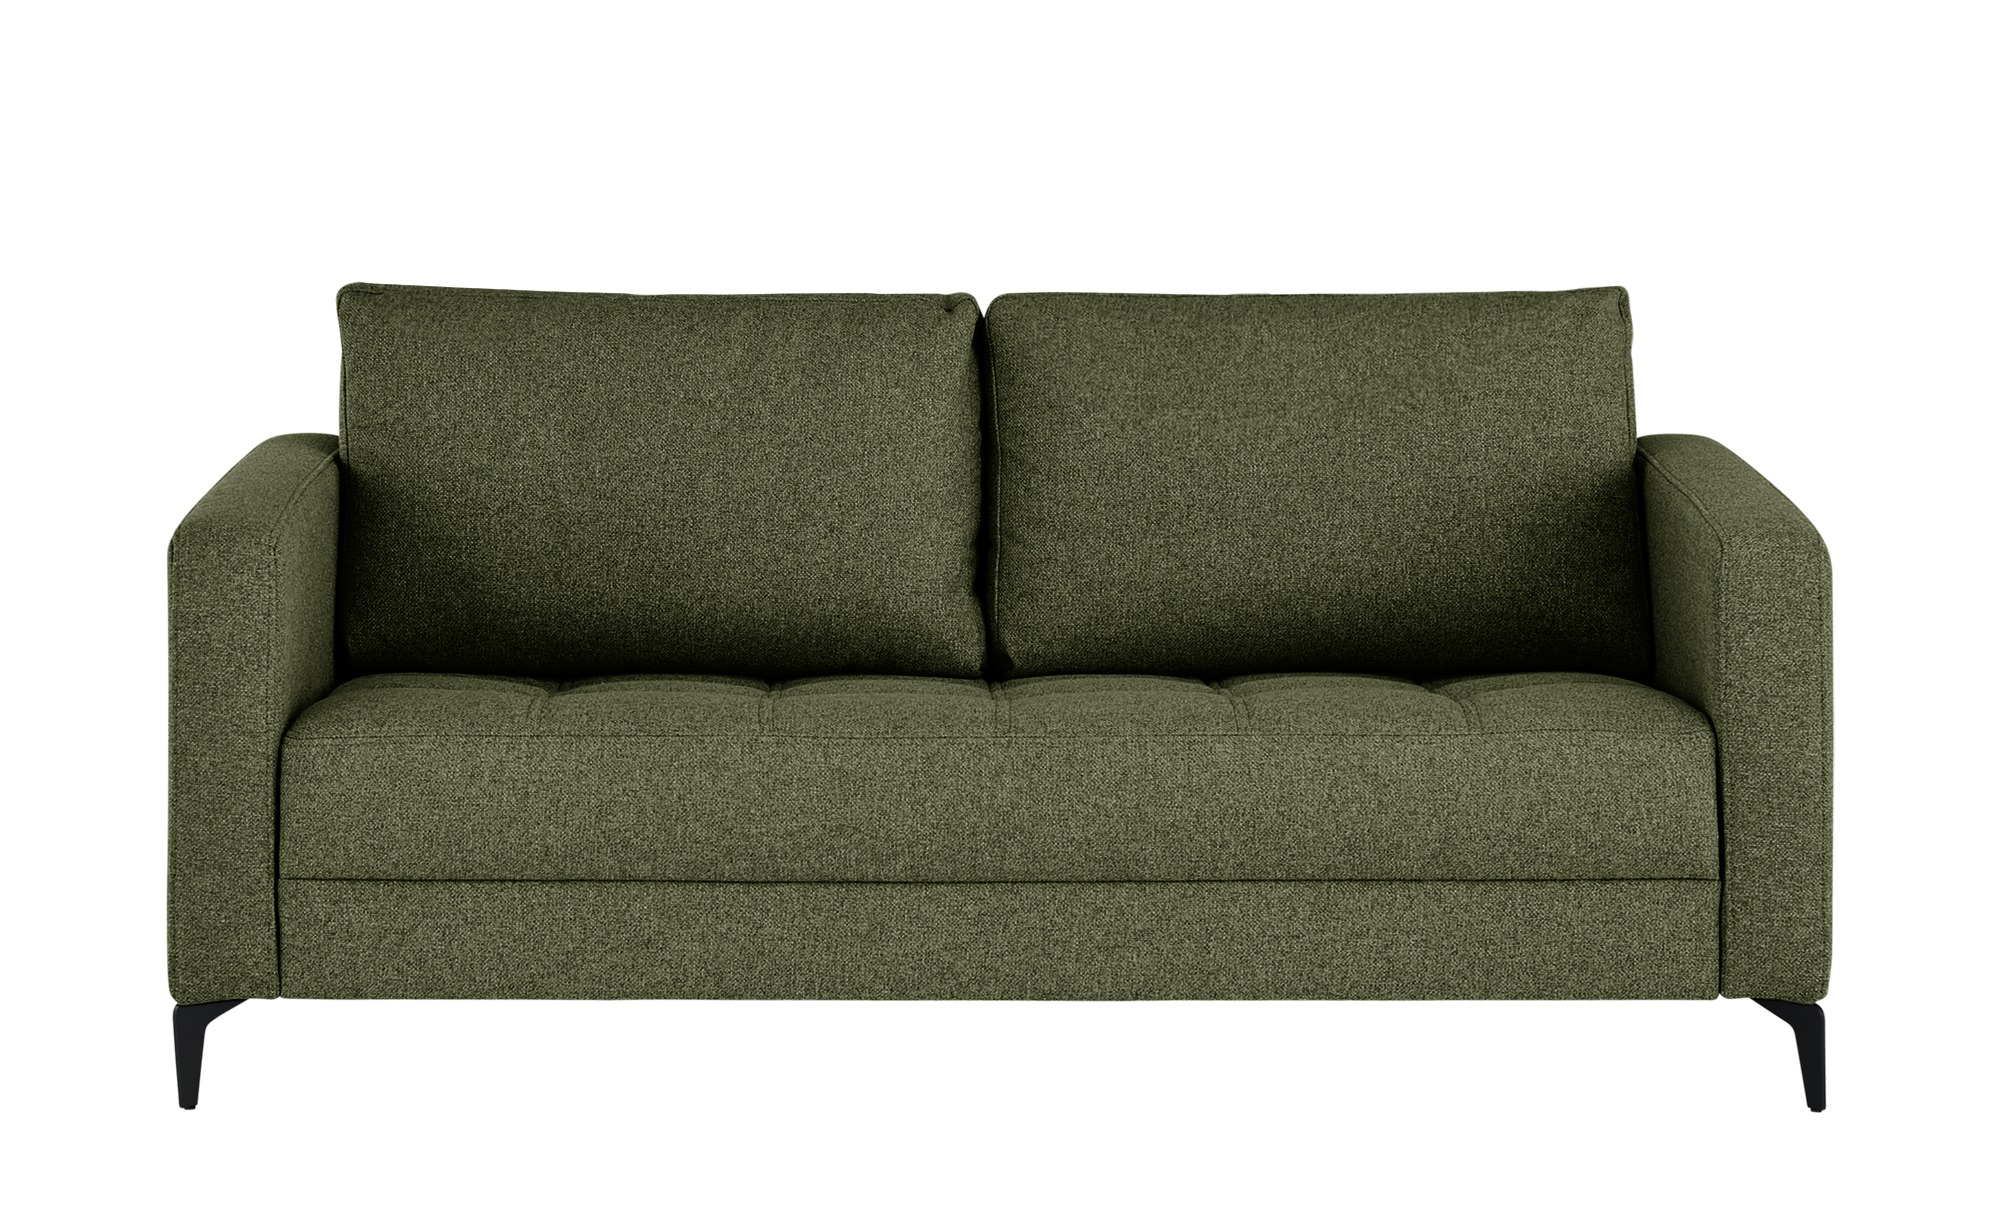 smart Sofa  Gesa ¦ grün ¦ Maße (cm): B: 178 H: 83 T: 91 Polstermöbel > Sofas > 2-Sitzer - Höffner